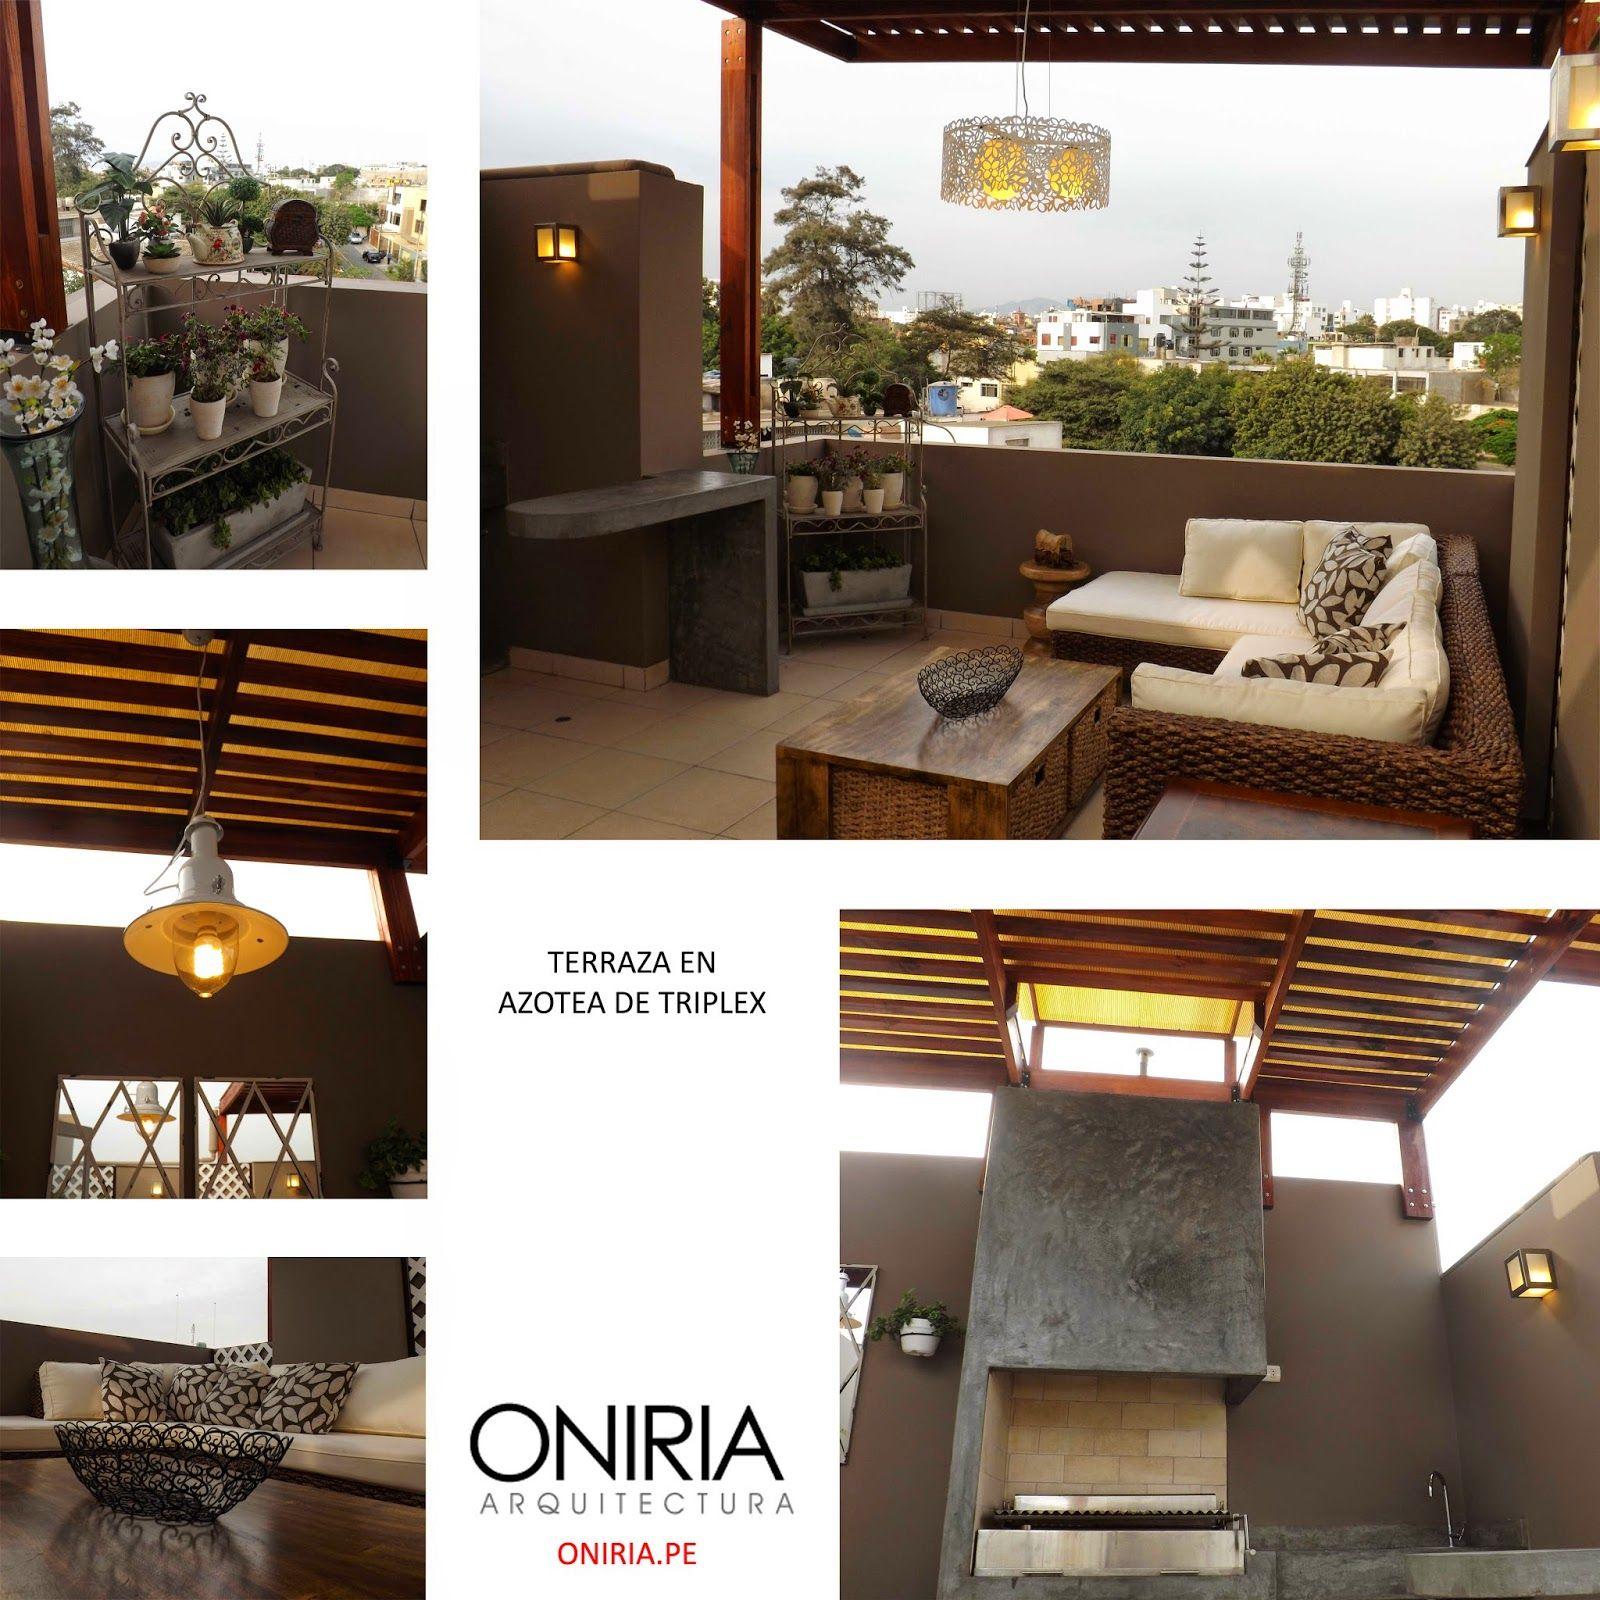 Dise o de terraza parrillas oniria arquitectura pinterest terrazas dise o de terraza y - Diseno de terraza ...